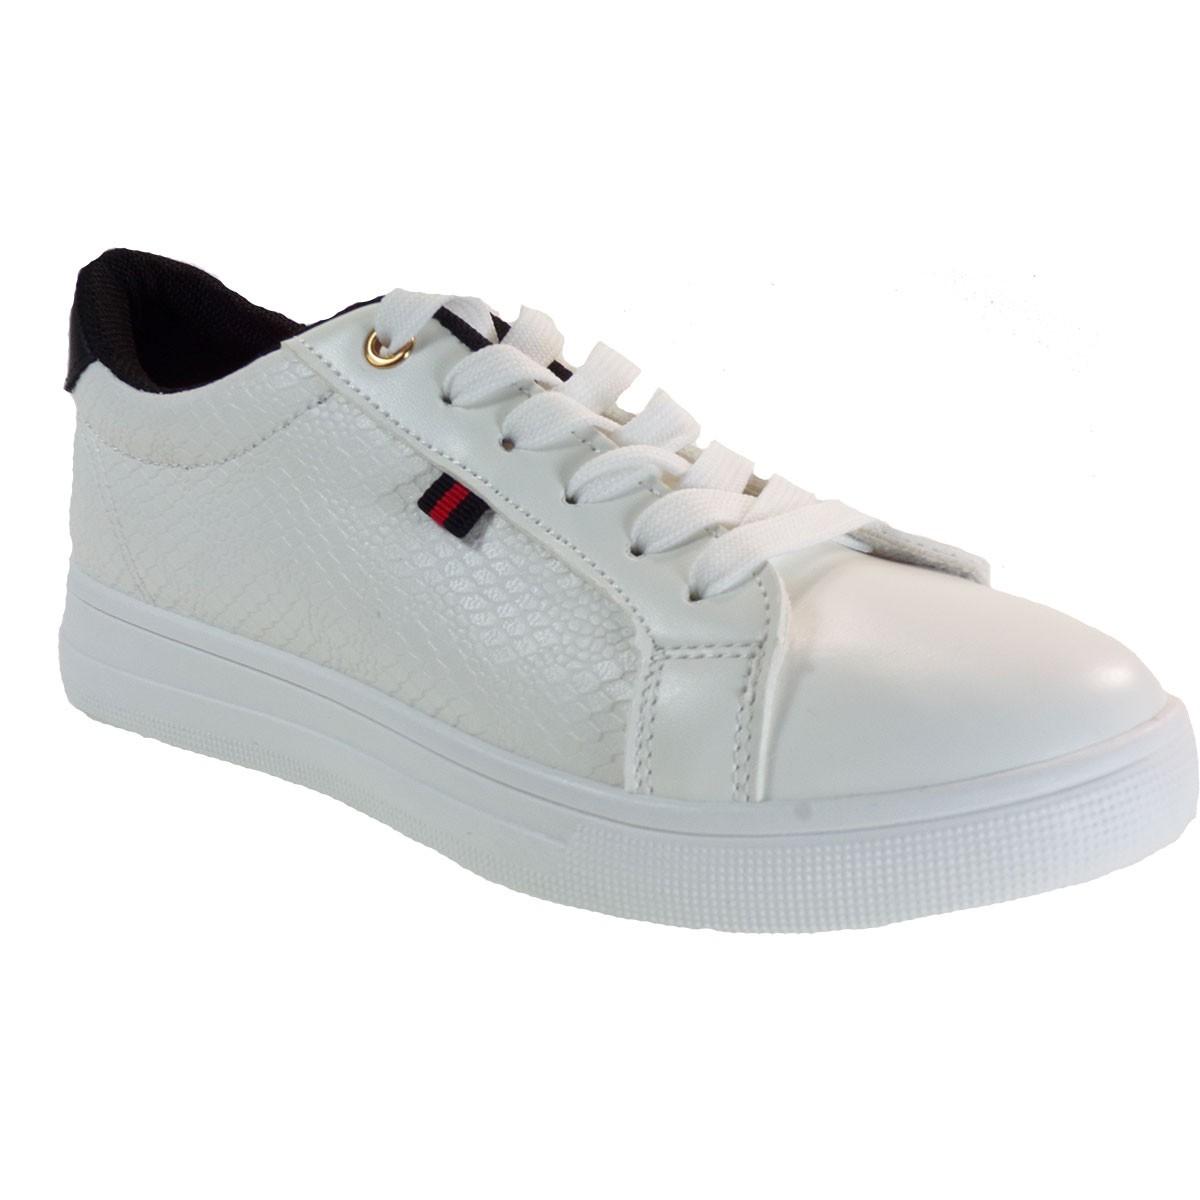 Bagiota Shoes Γυναικεία Παπούτσια Sneakers Αθλητικά BY-0352 Λευκό-Μαύρο